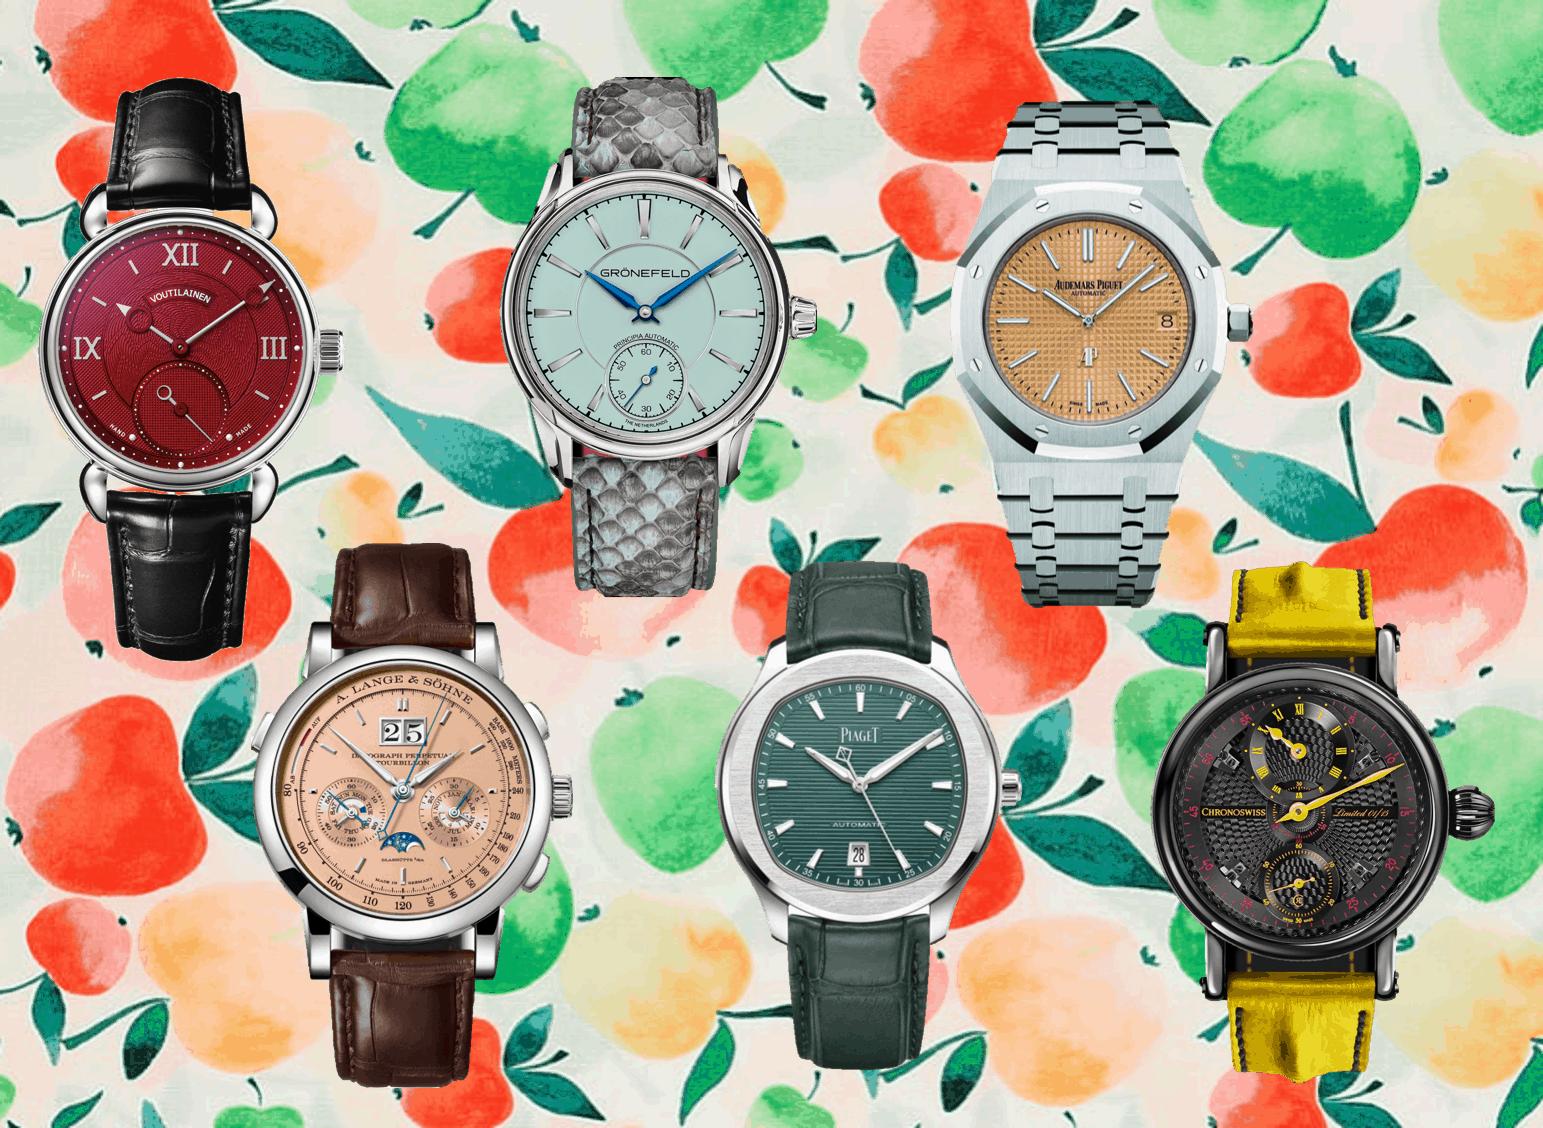 Farbiges Zifferblatt bei LuxusuhrenEdle Uhren und farbiges Zifferblatt: Bekennen Sie Farbe!